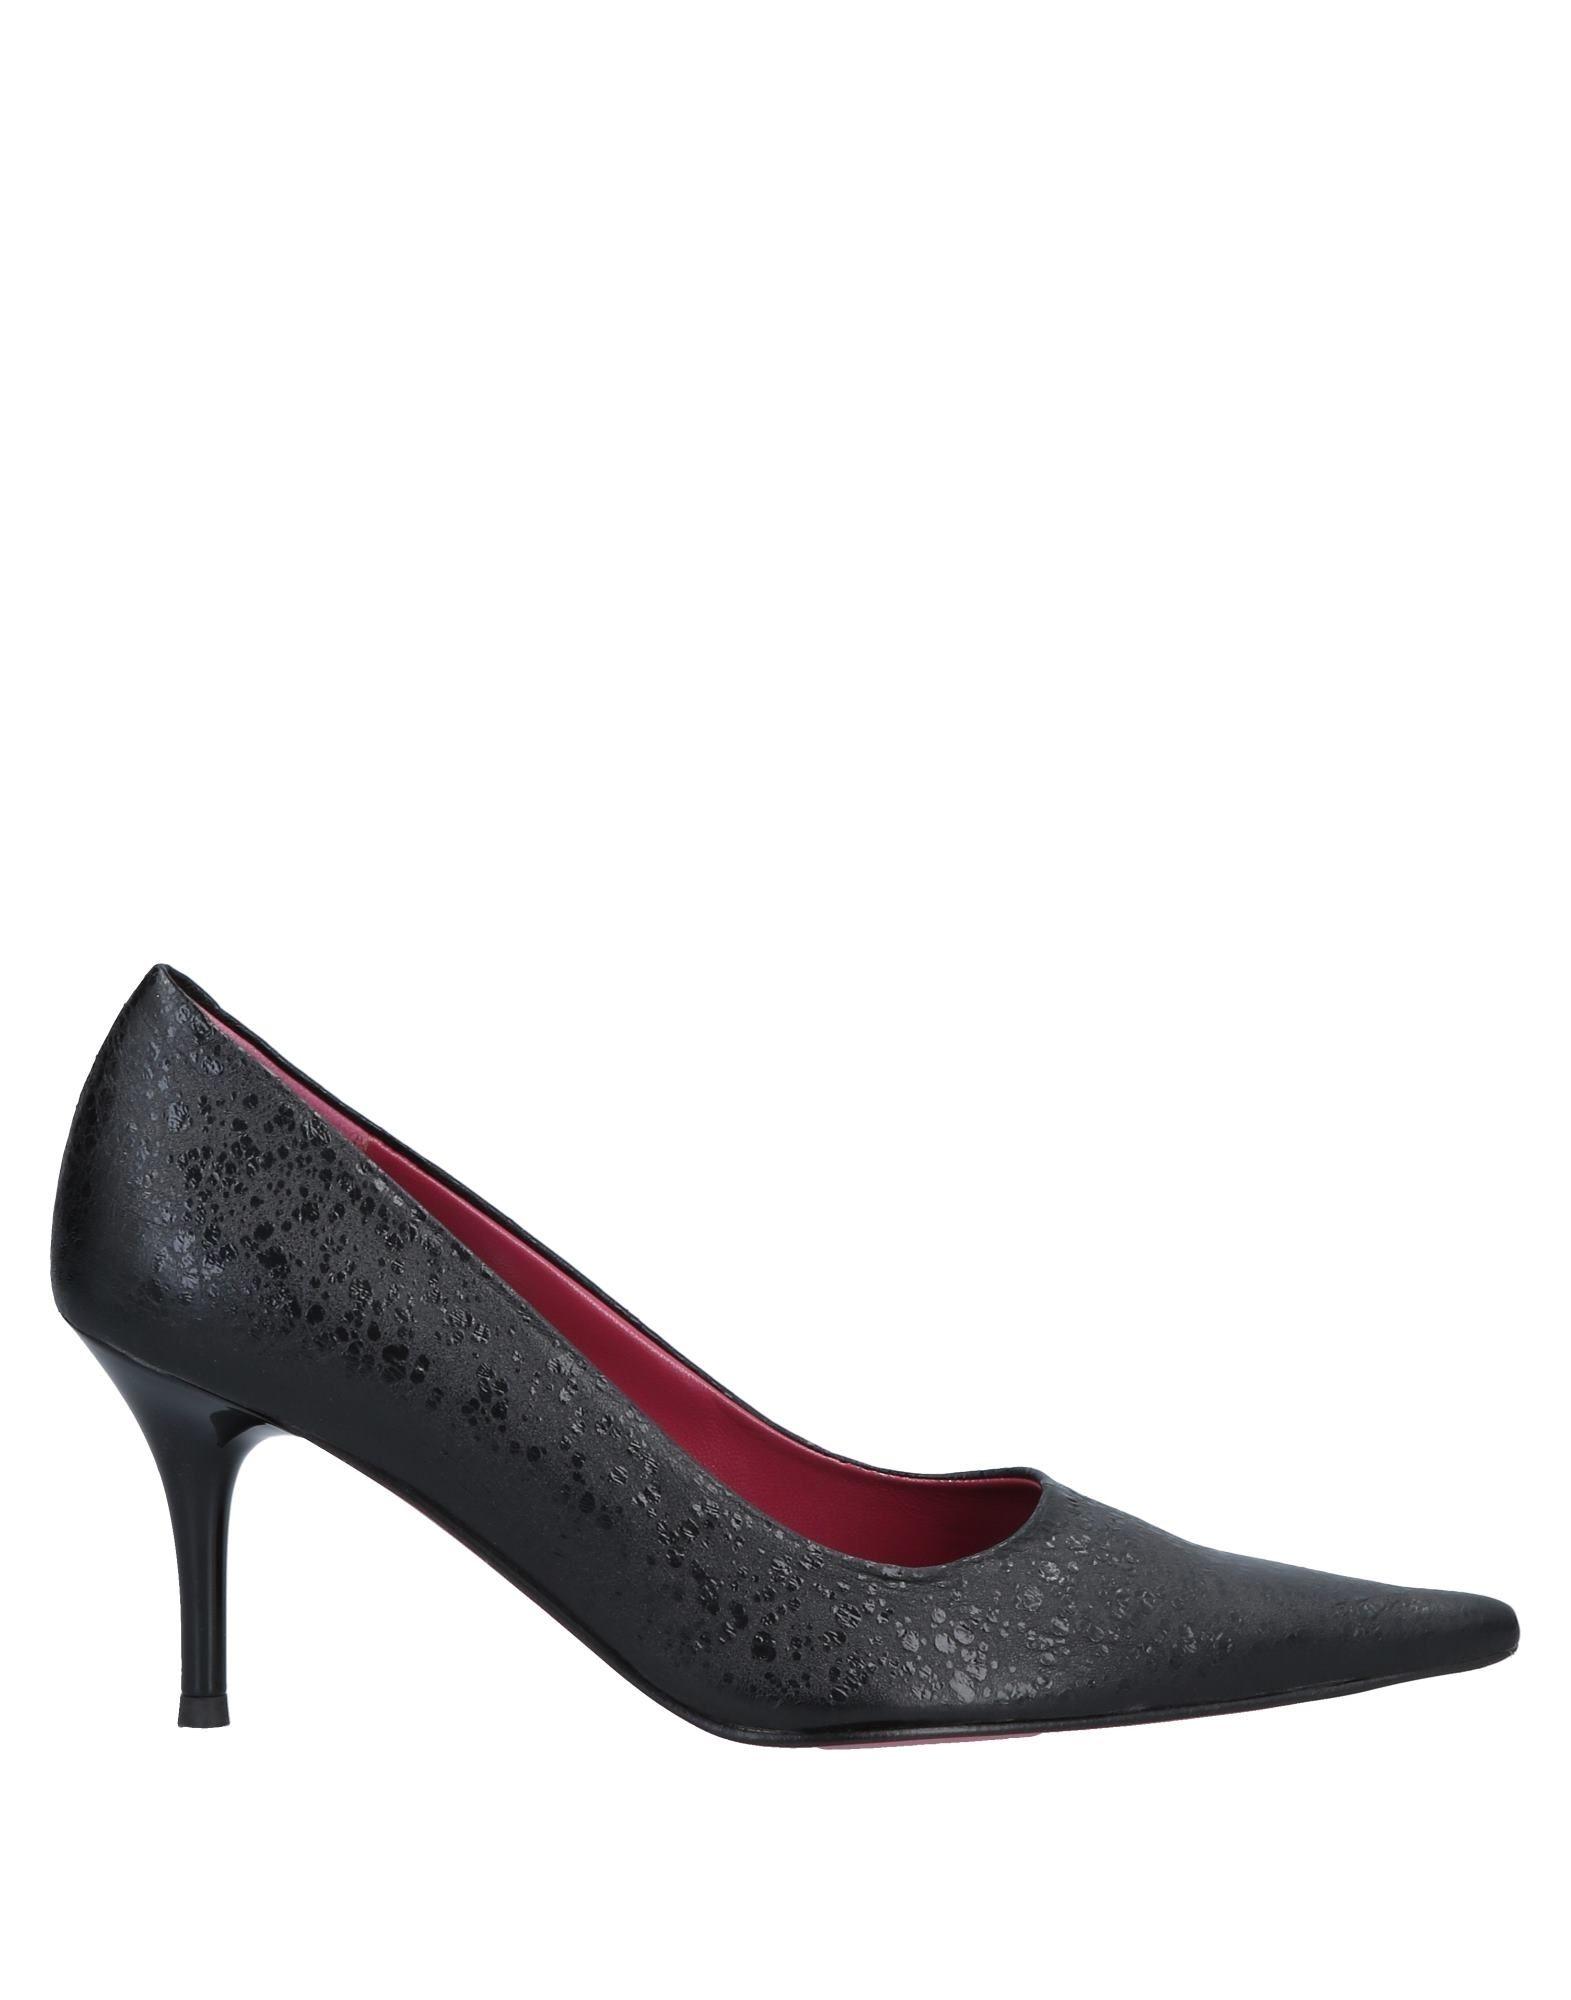 Stilvolle billige  Schuhe Versace Pumps Damen  billige 11566955QD 26162d